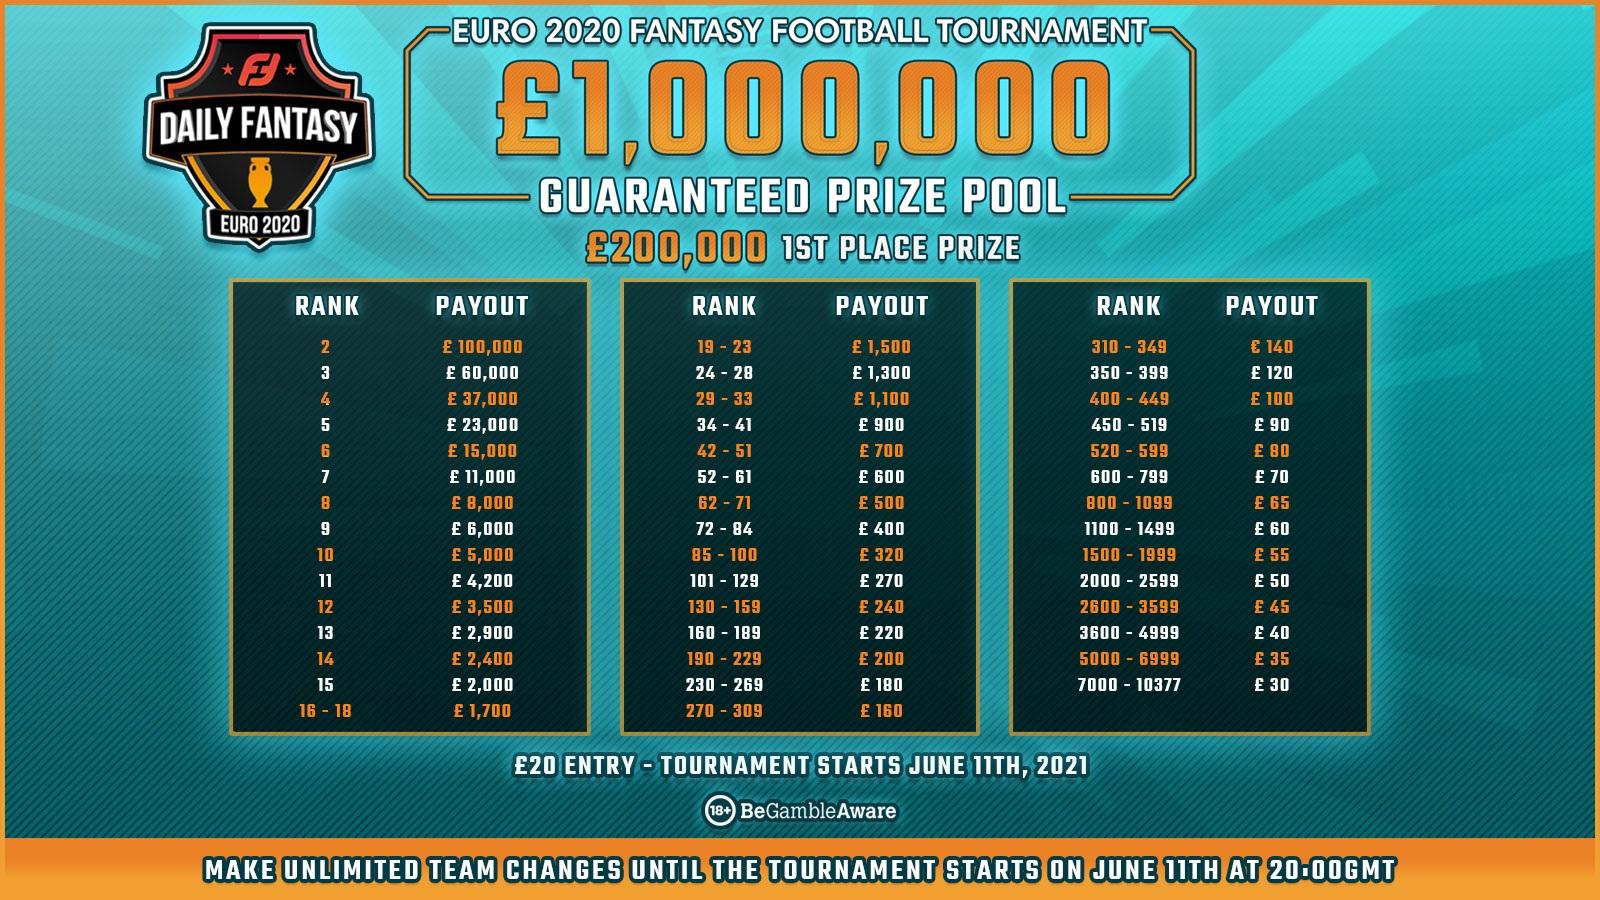 FanTeam Euro2020 £1,000,000 fantasy game prize money